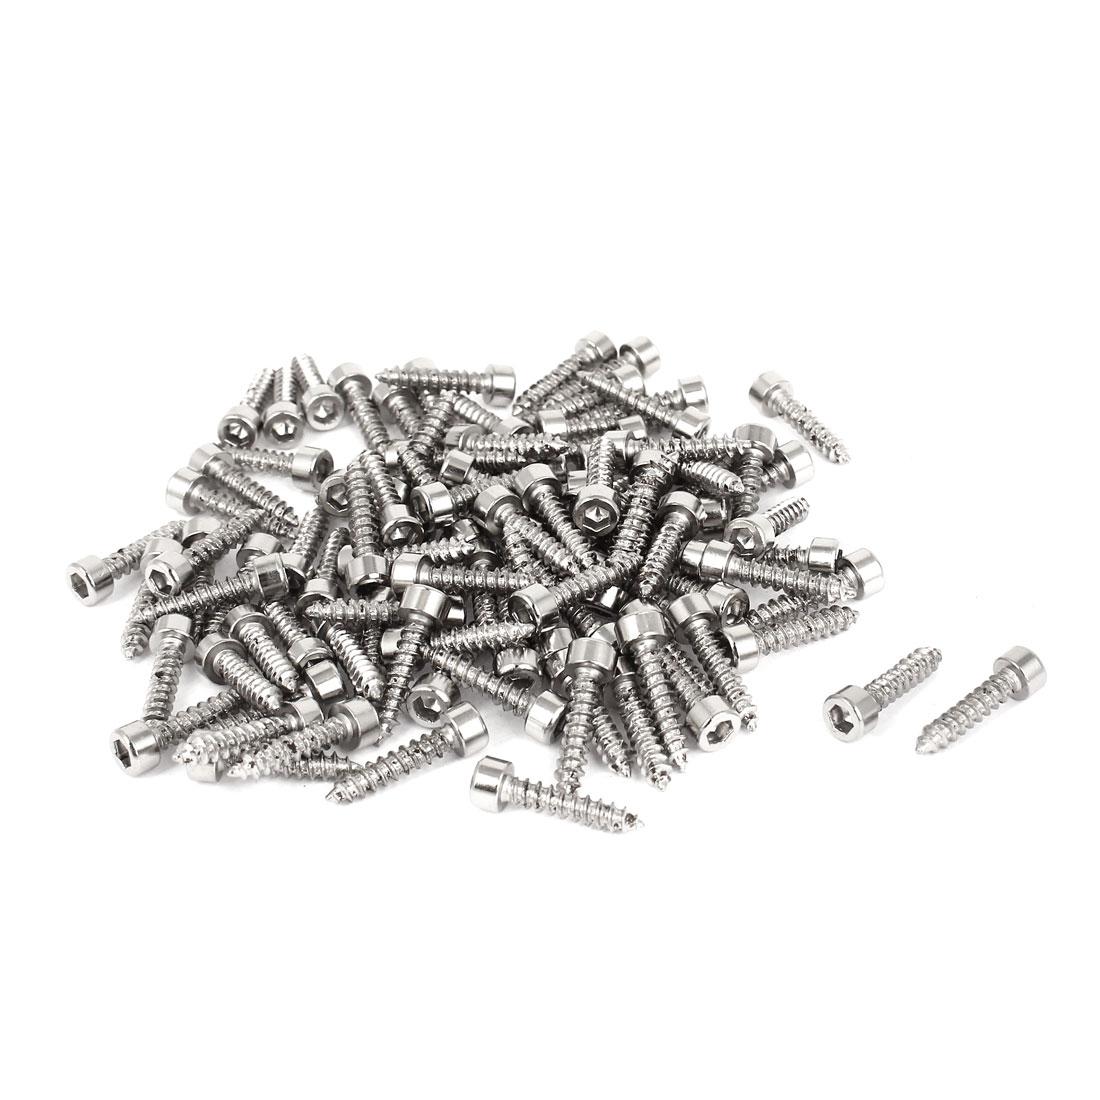 100 Pcs Nickel Plated Hexagon Socket Cap Head Self Tapping Wood Screws M3.5x16mm